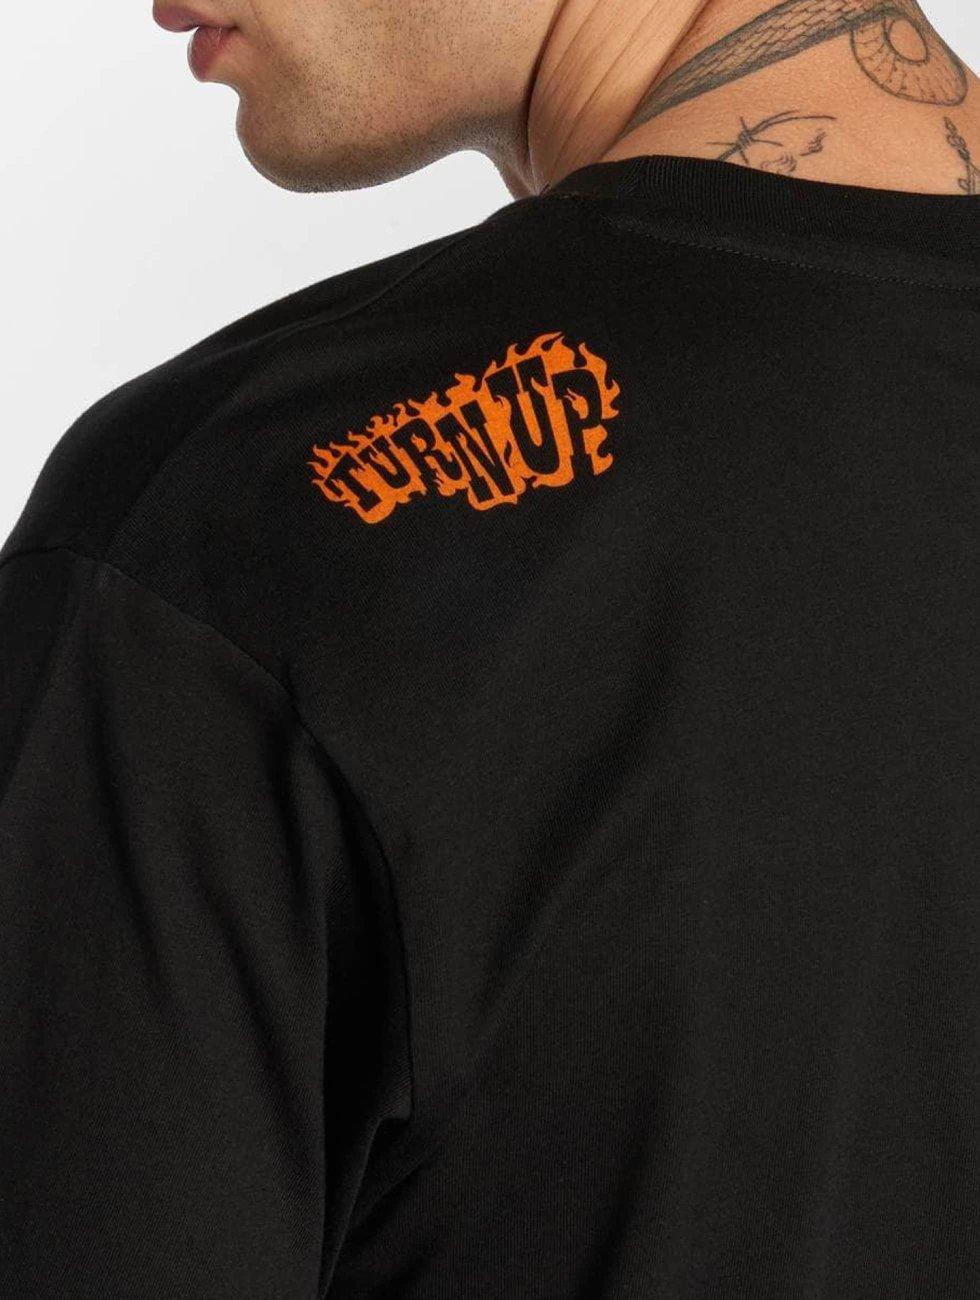 TurnUP T-Shirt F U schwarz